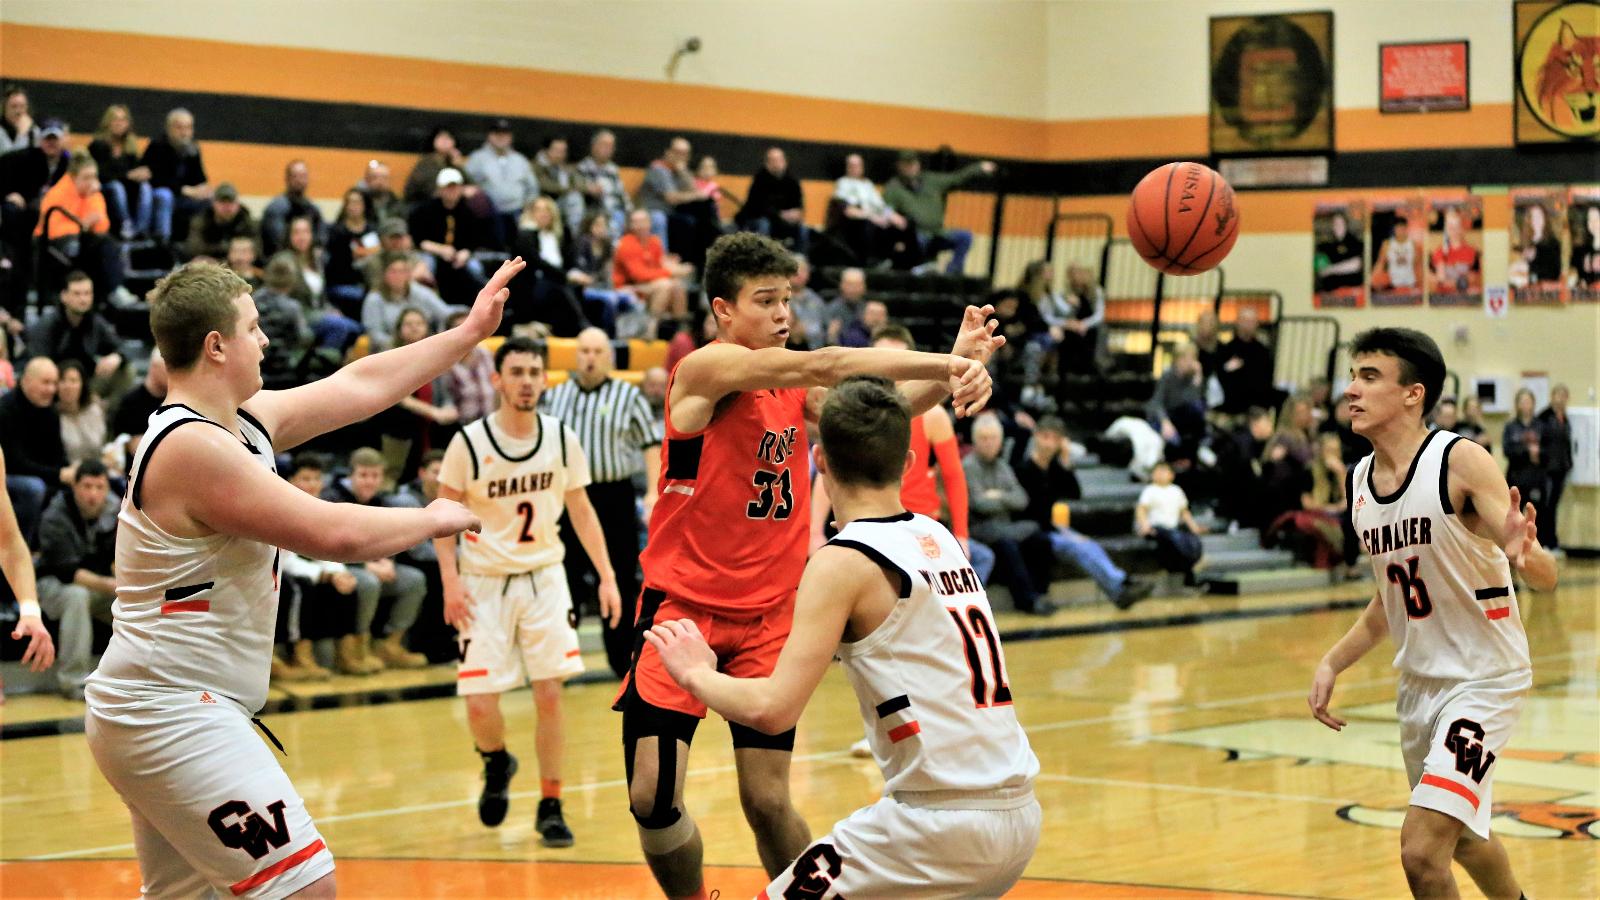 Boys varsity basketball falls to lowellville 78-55